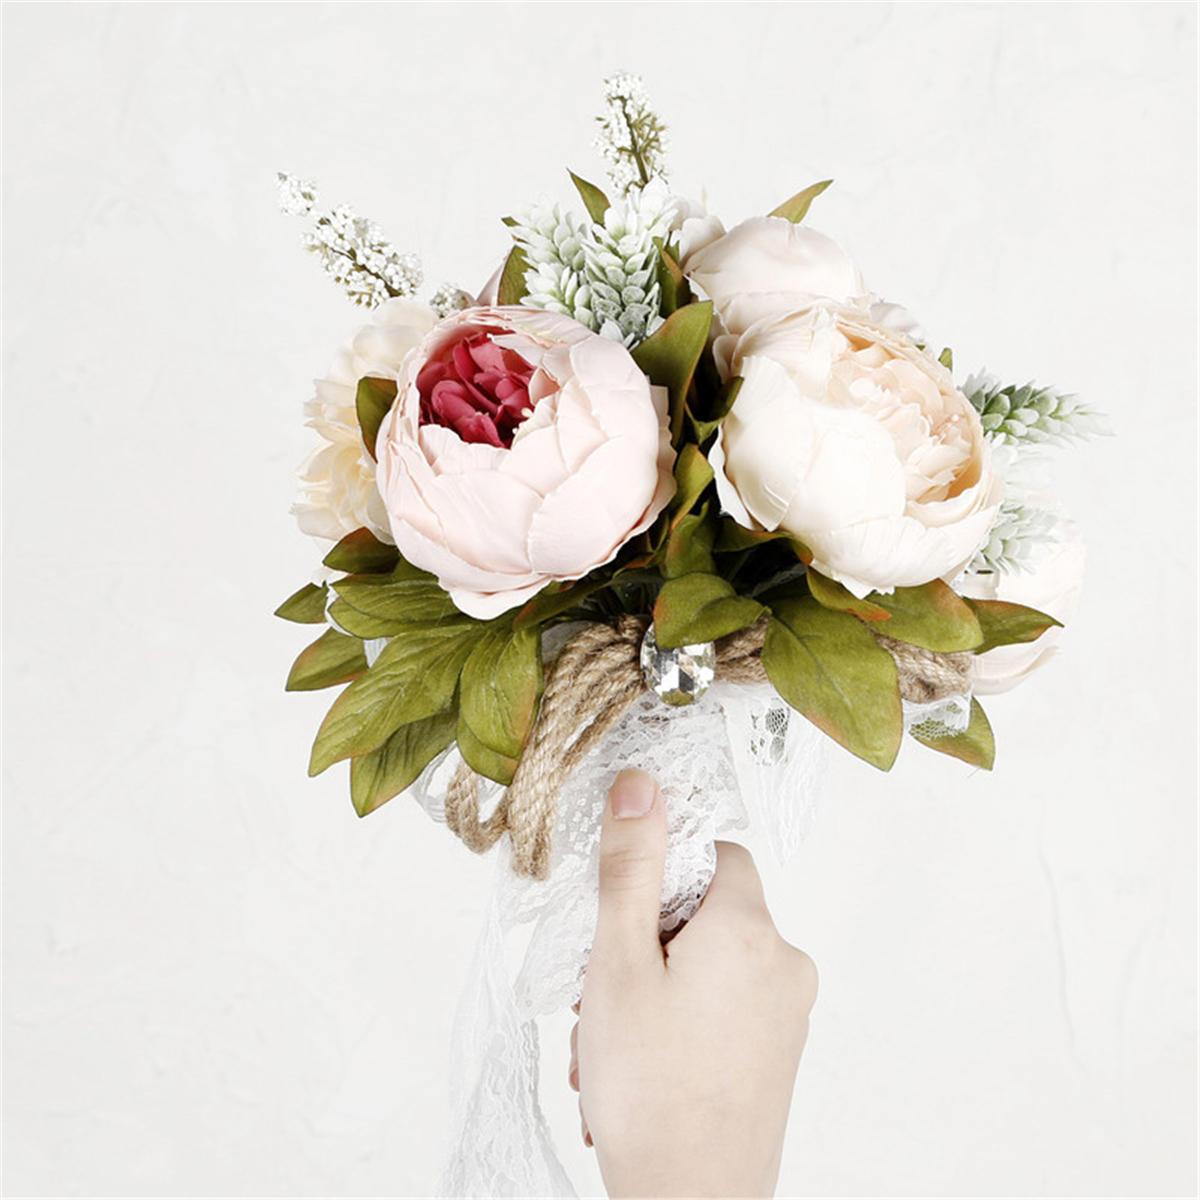 Women Bridal Bouquet Artificial Flower Rose Accessories Bridesmaid Wedding Favors Decor